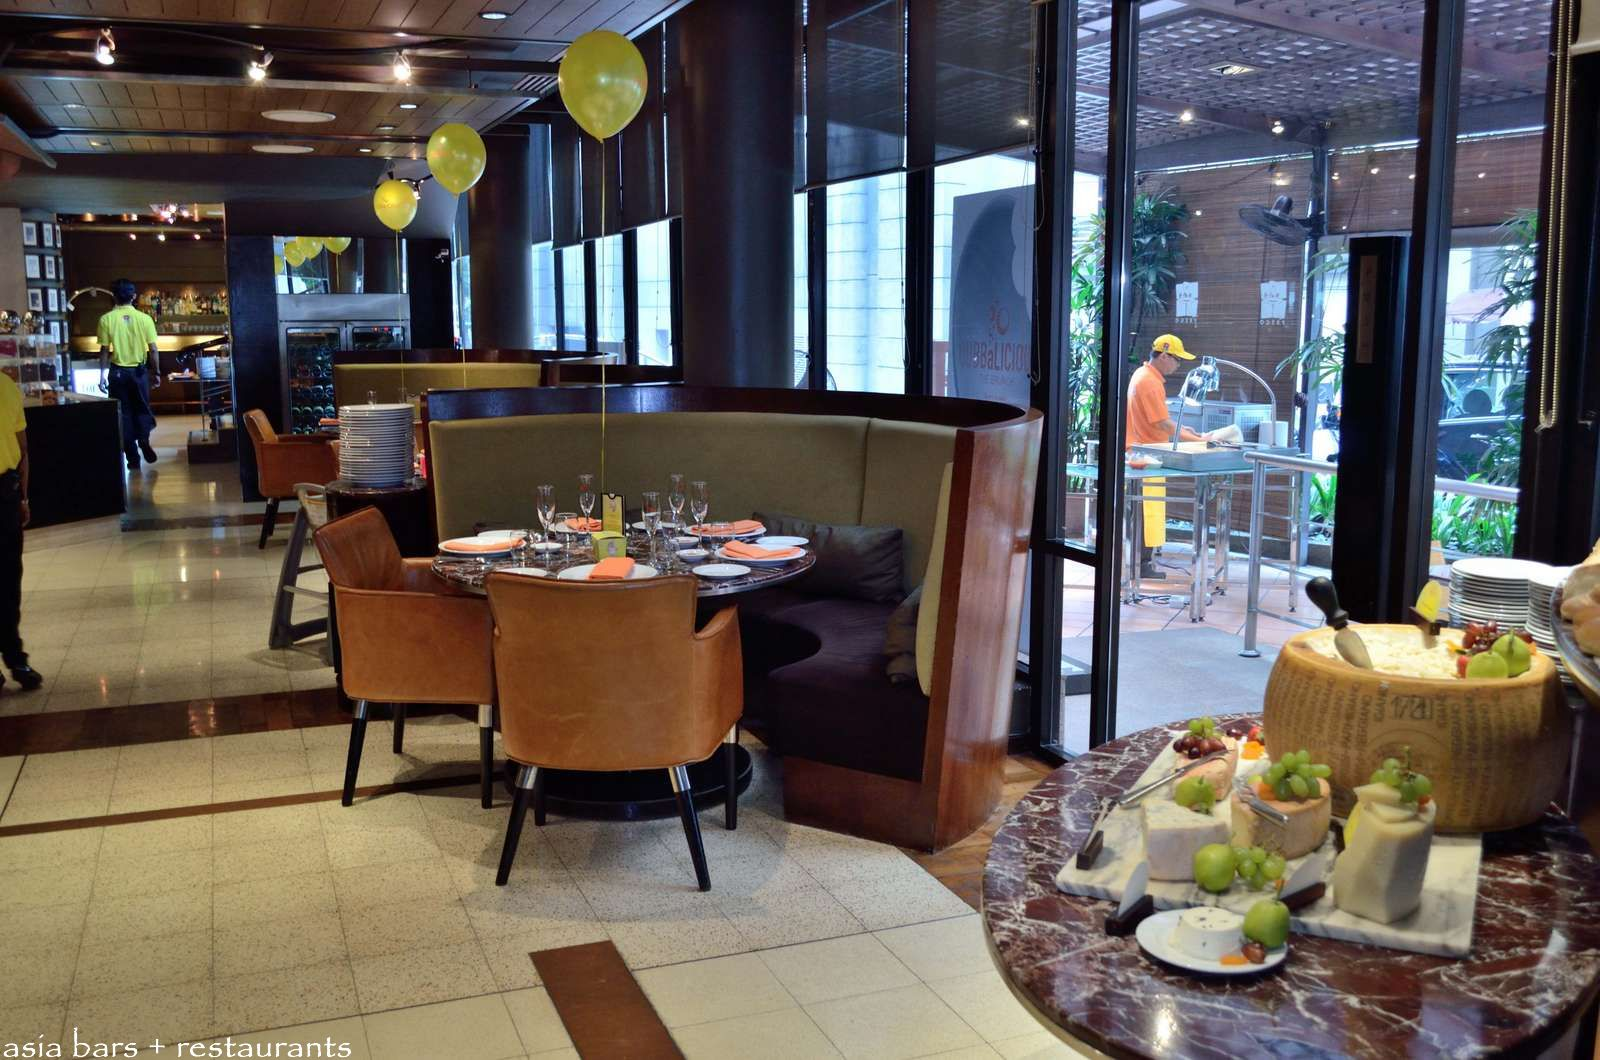 Prego modern Italian restaurant at The Westin Kuala  : 06 kl april319 from www.asia-bars.com size 1600 x 1060 jpeg 270kB